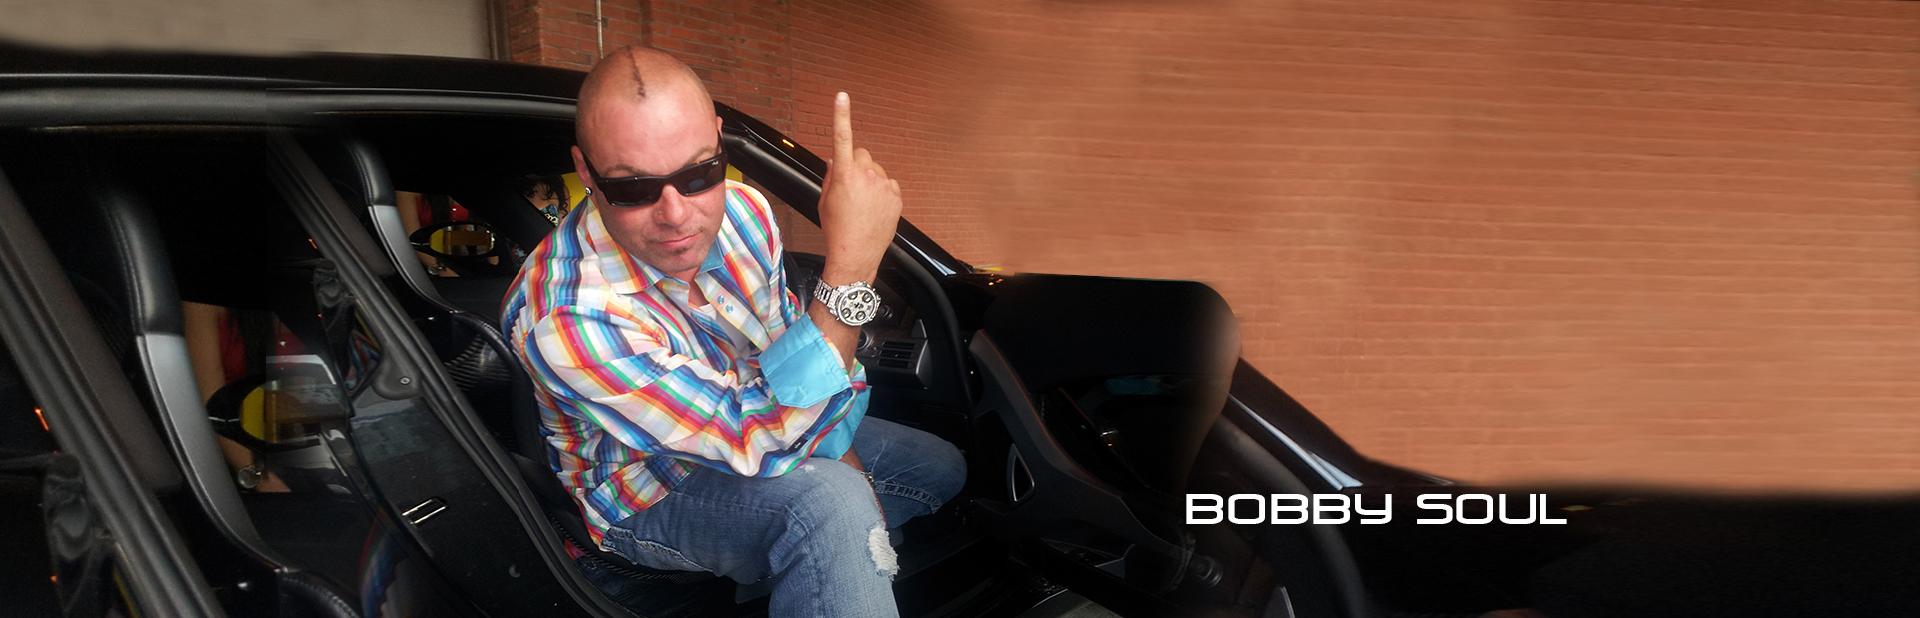 Bobby-Soul-3